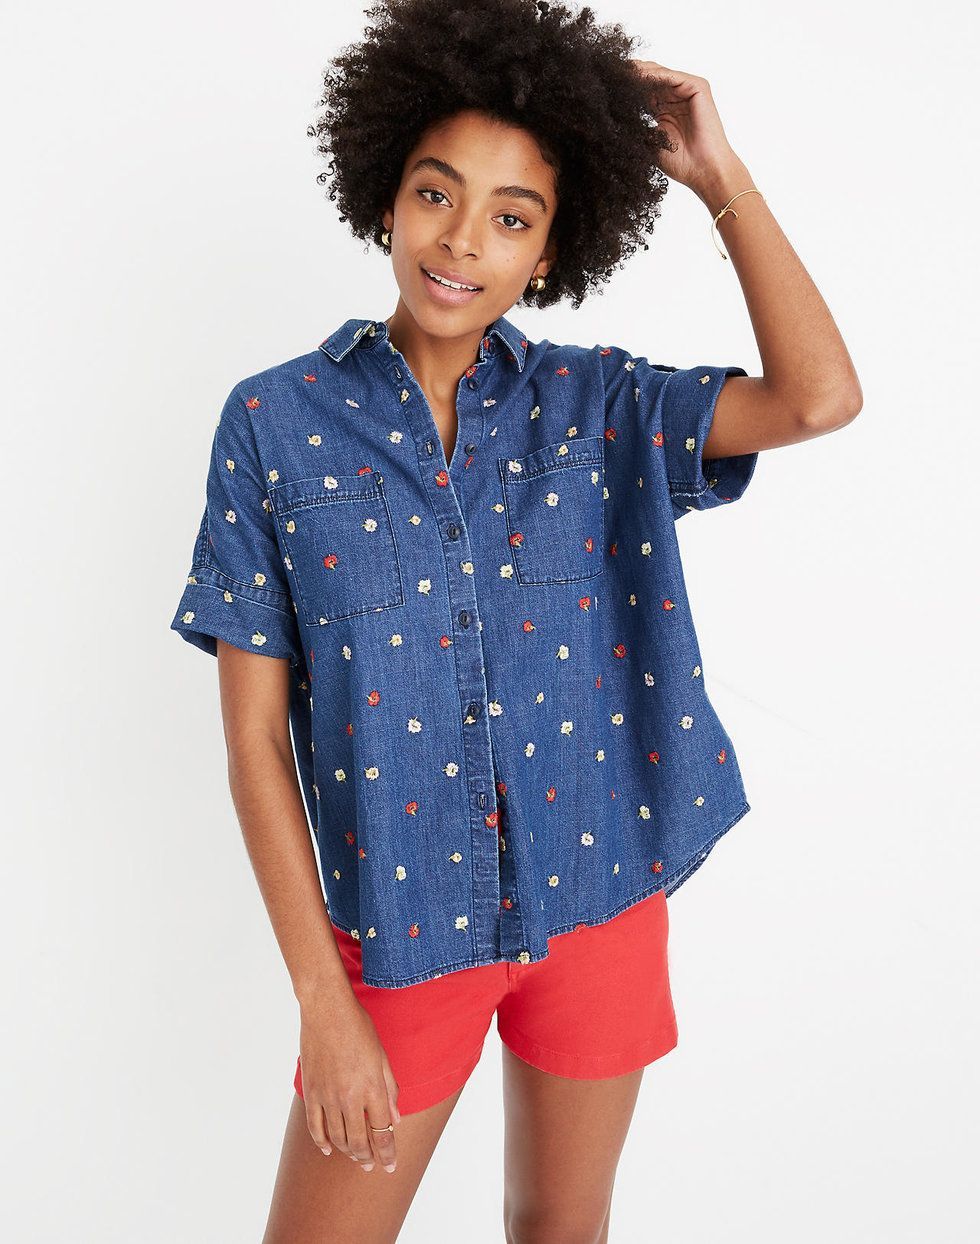 Madewell embroidered denim shirt